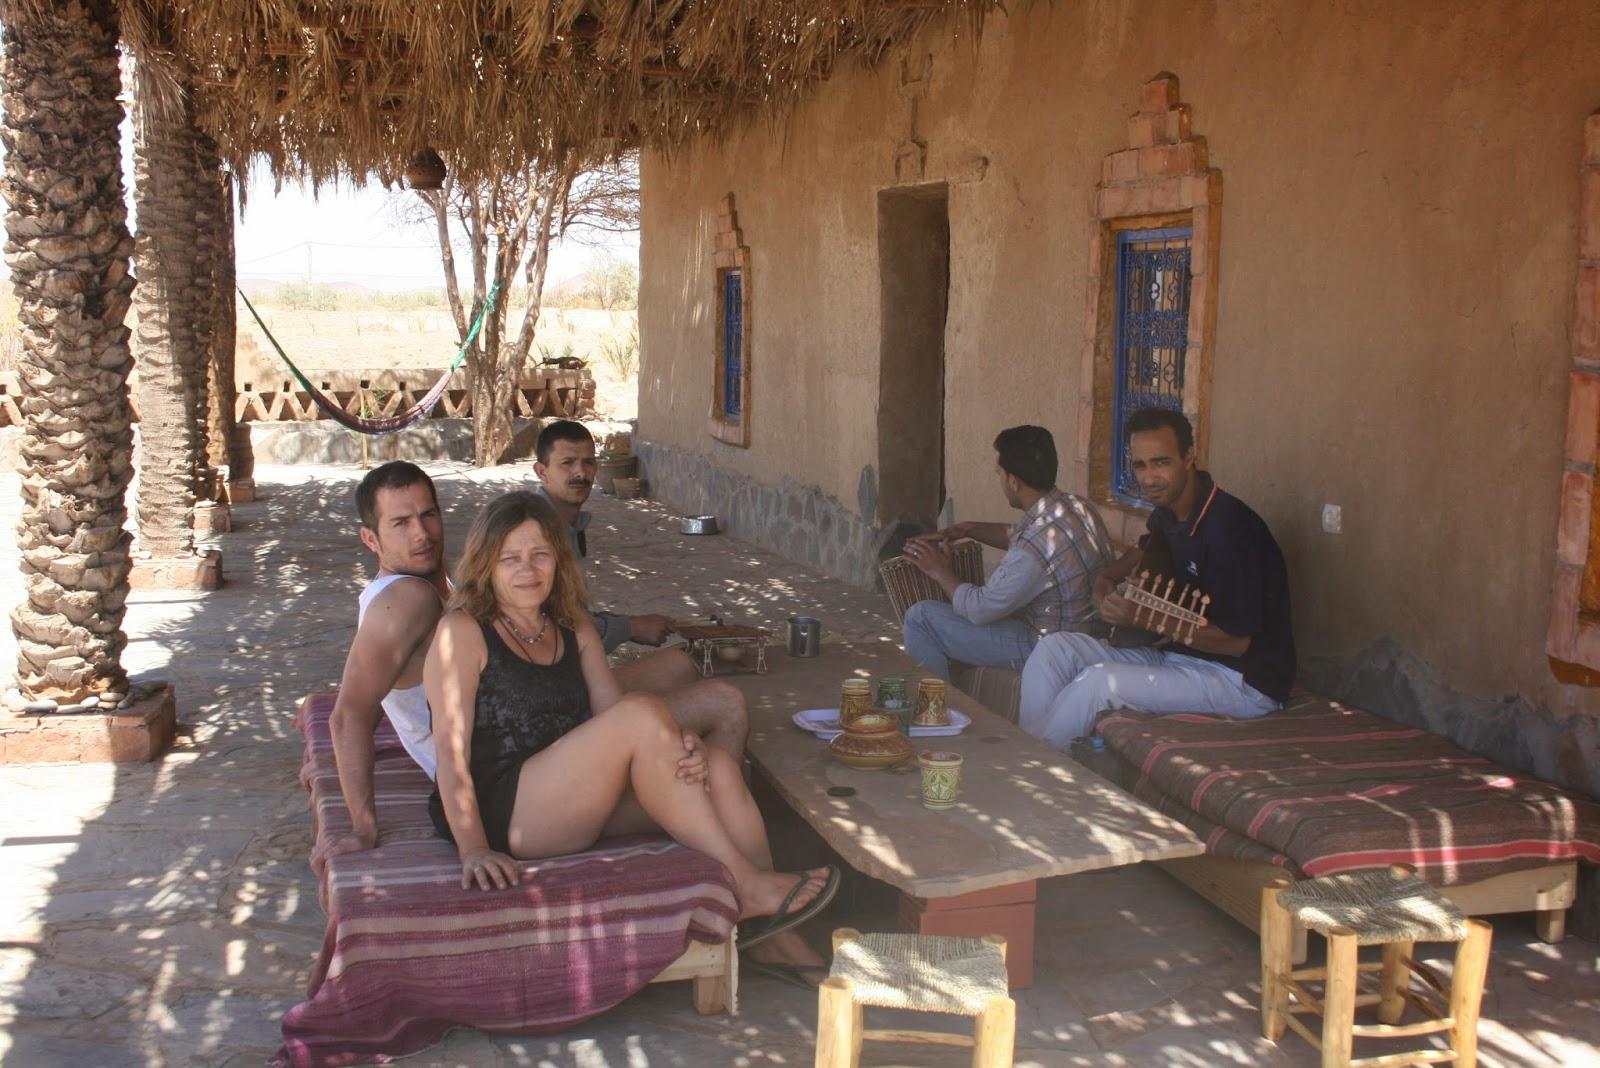 lunasurmarruecos, kasbah luna del sur, desierto de marruecos, arfoud, merzouga, viajes